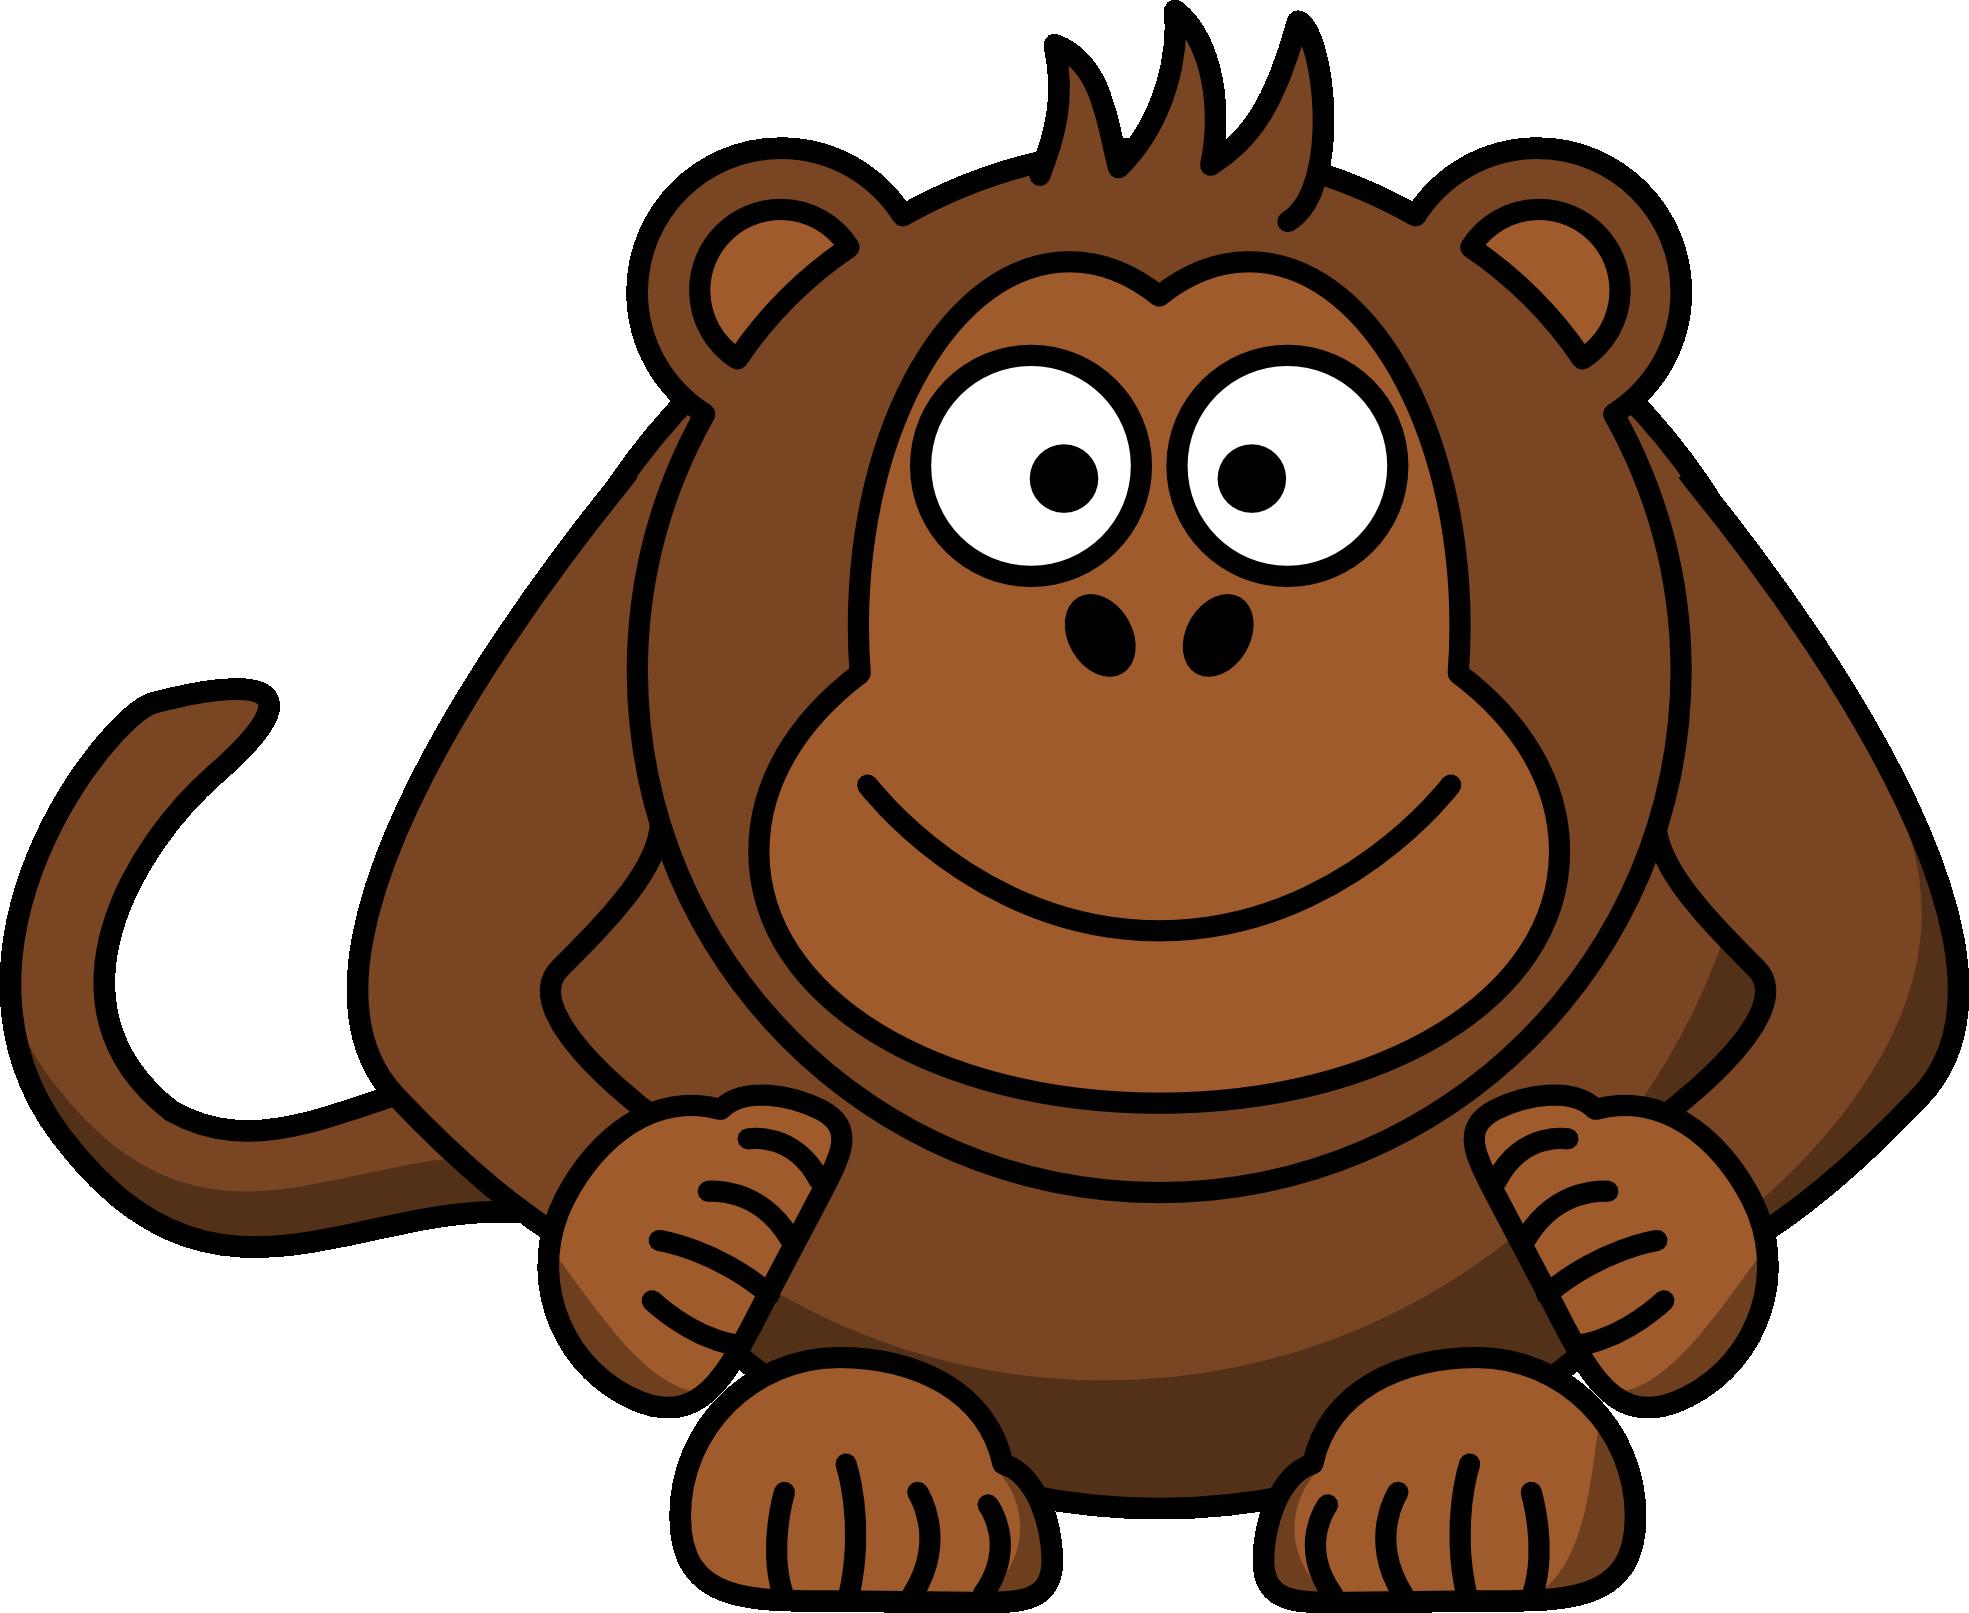 monkey cartoon clipart panda free clipart images chimpanzee face clipart 200 Drawing of Chimpanzees